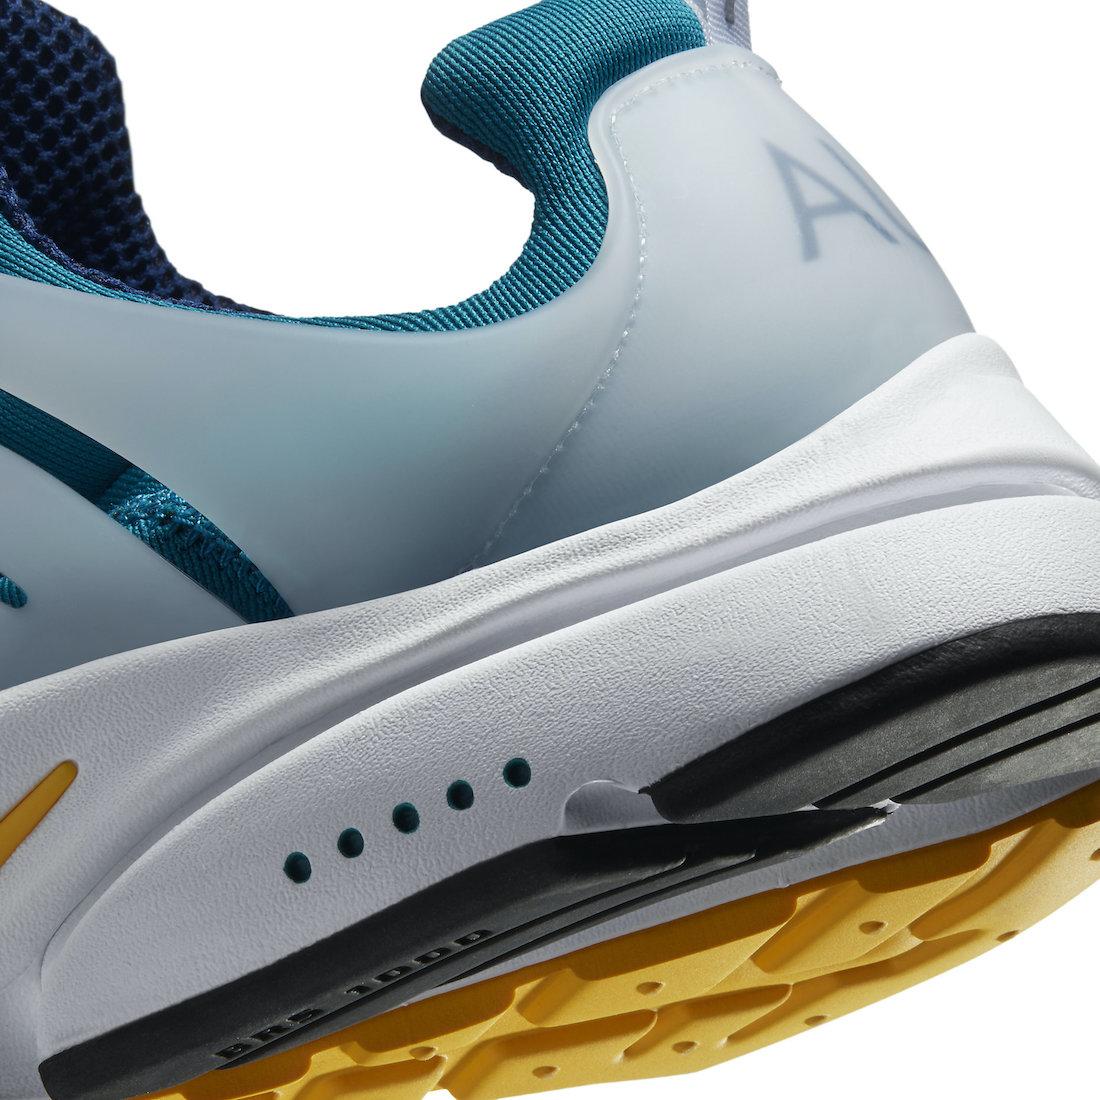 Nike-Air-Presto-Fresh-Water-Australia-CJ1229-301-2020-Release-Date-7